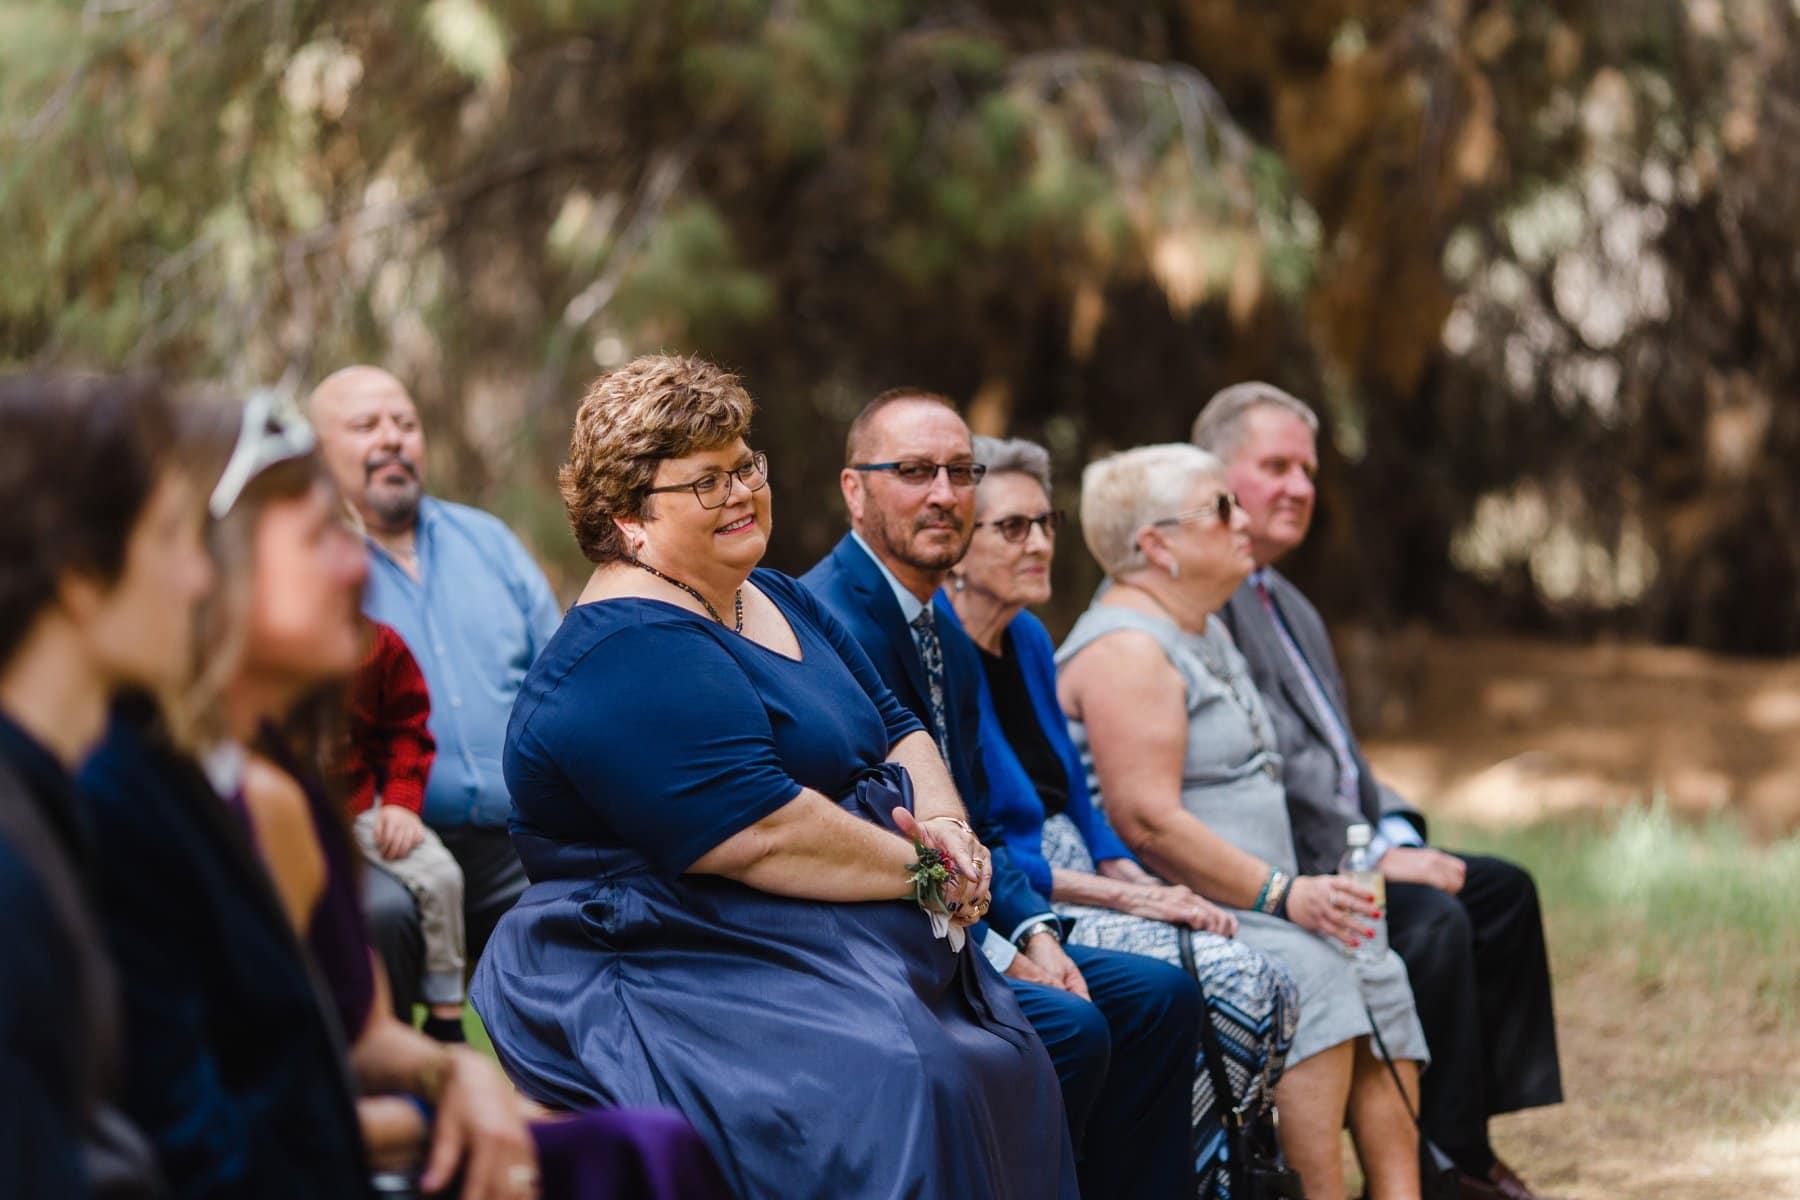 wedding ceremony at Schnepf Farms the Meadows